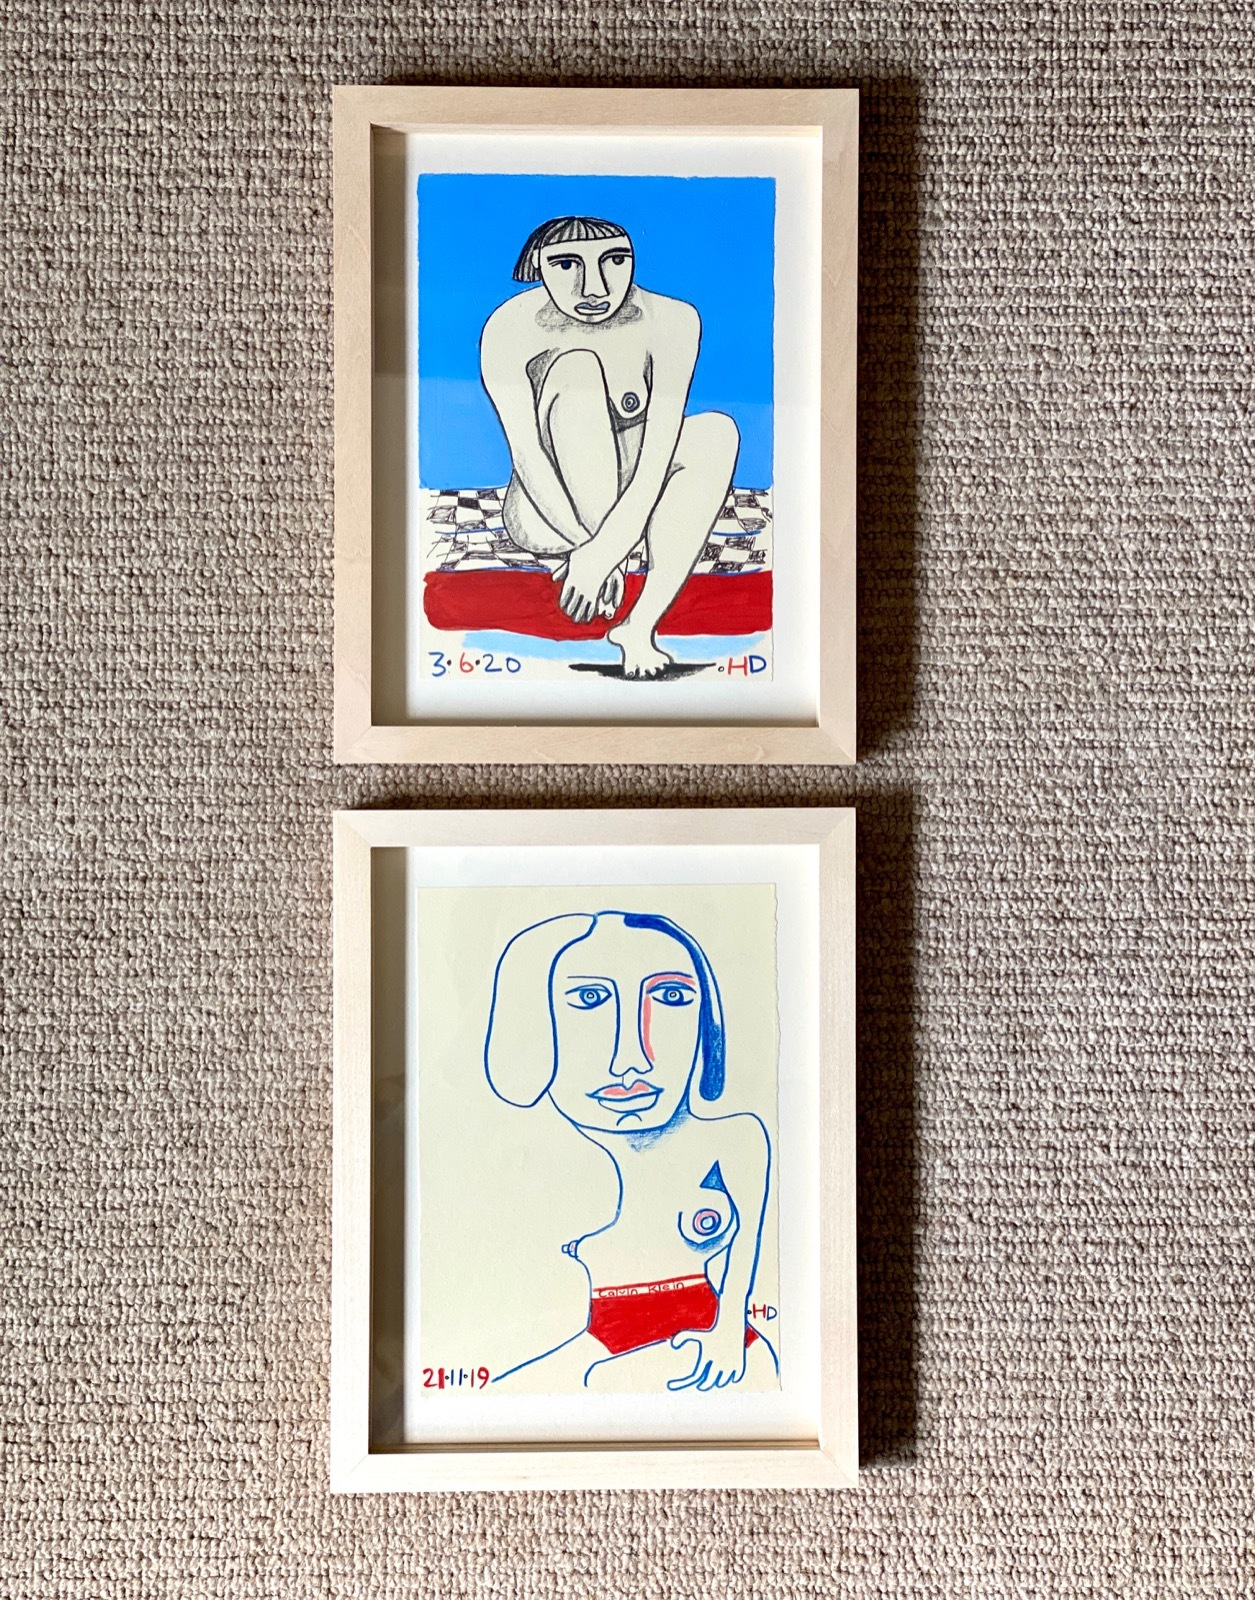 Delightful pair of paintings by Henrietta Dubrey